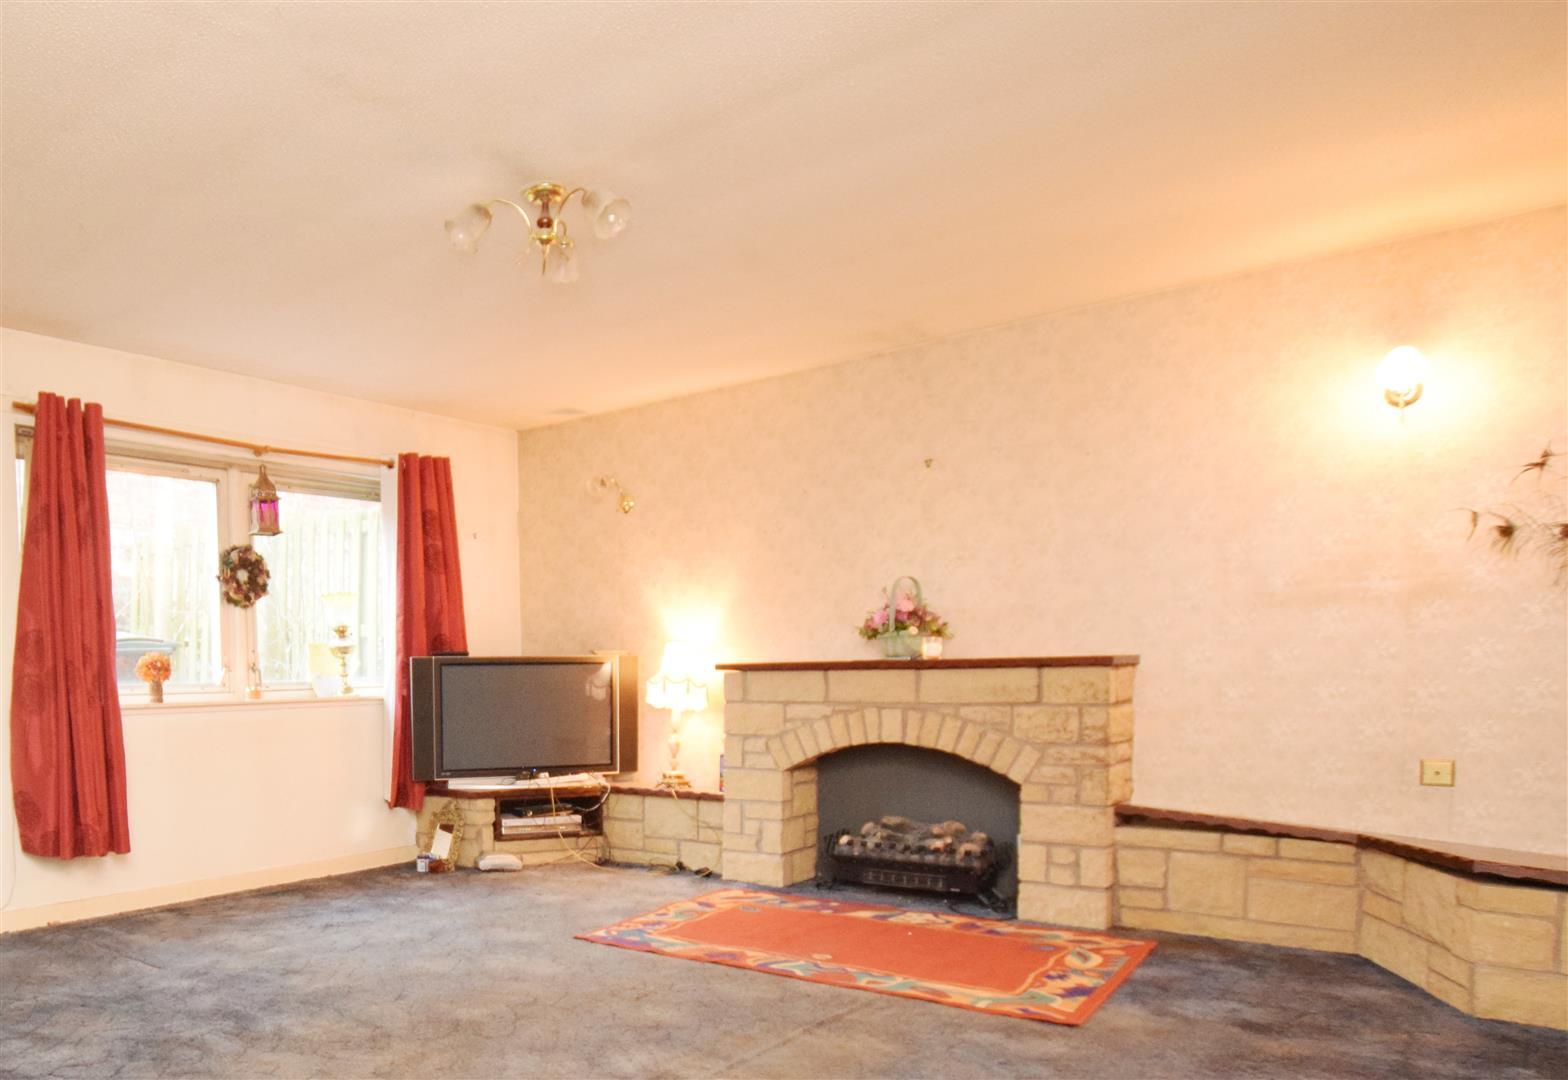 Flat 3, 48 Perth Road, Blairgowrie, Perthshire, PH10 6DN, UK